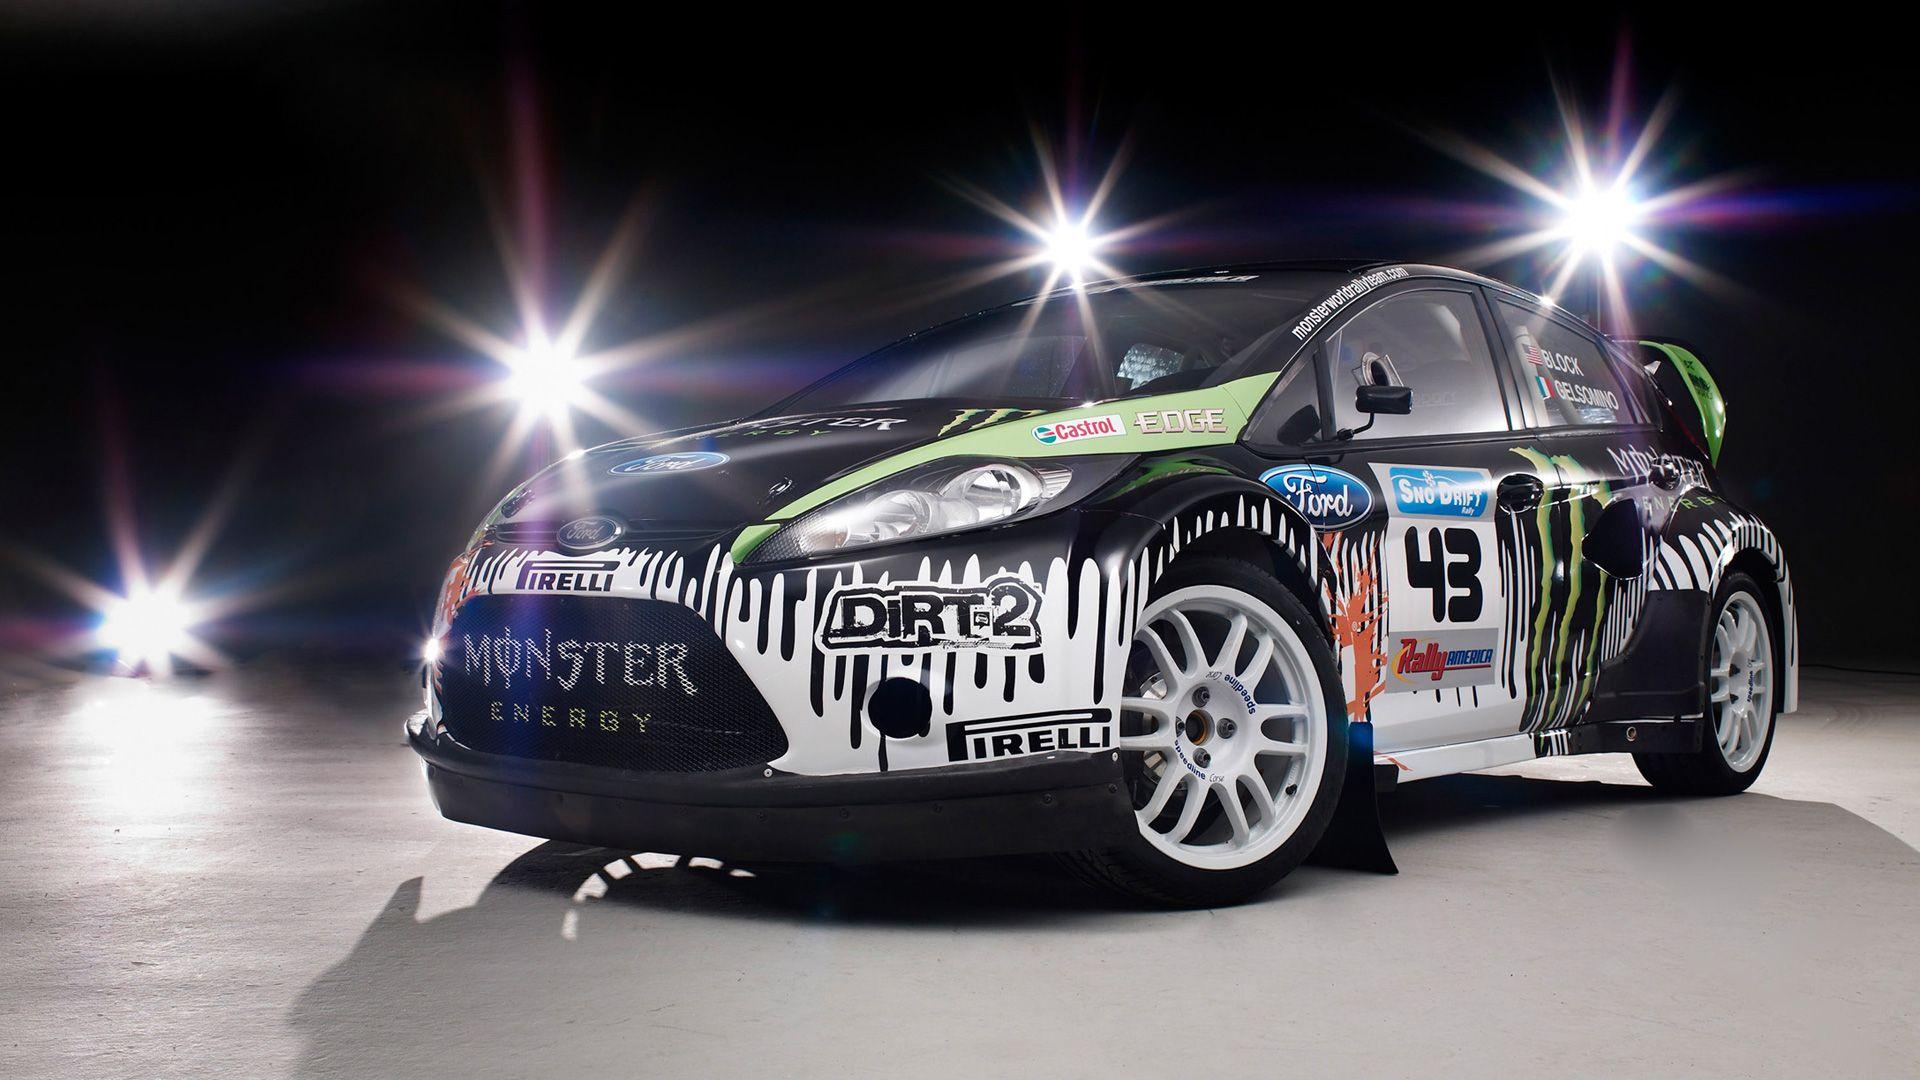 Ford Fiesta Monster Energy Wallpaper Hd Wallpaper Carro